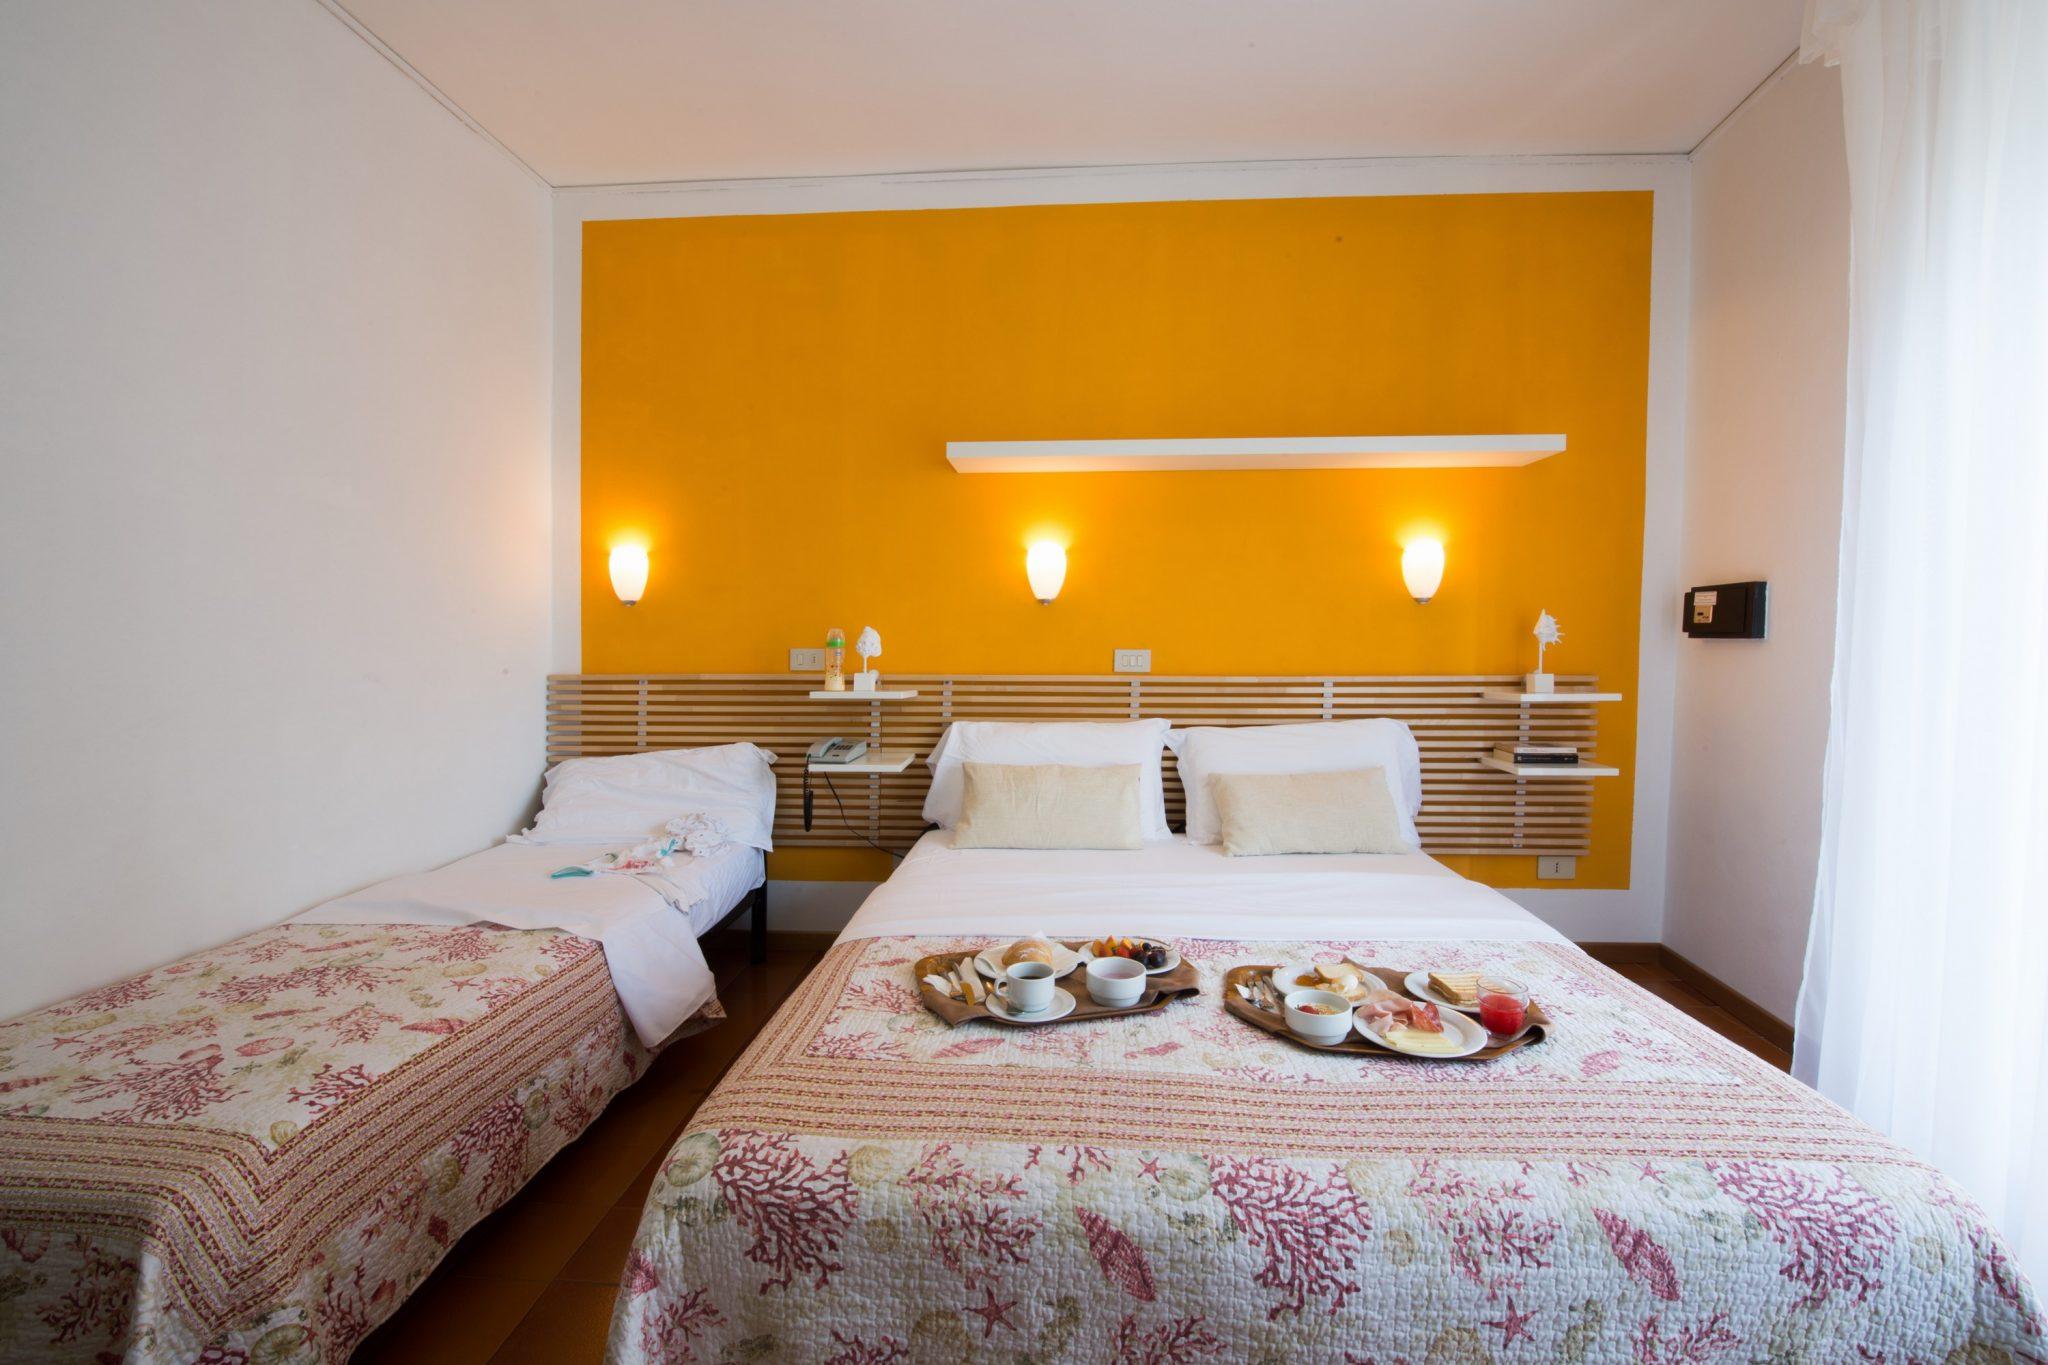 http://www.hotelvenezuela.it/wp-content/uploads/2016/11/mini-HVE_0159.jpg